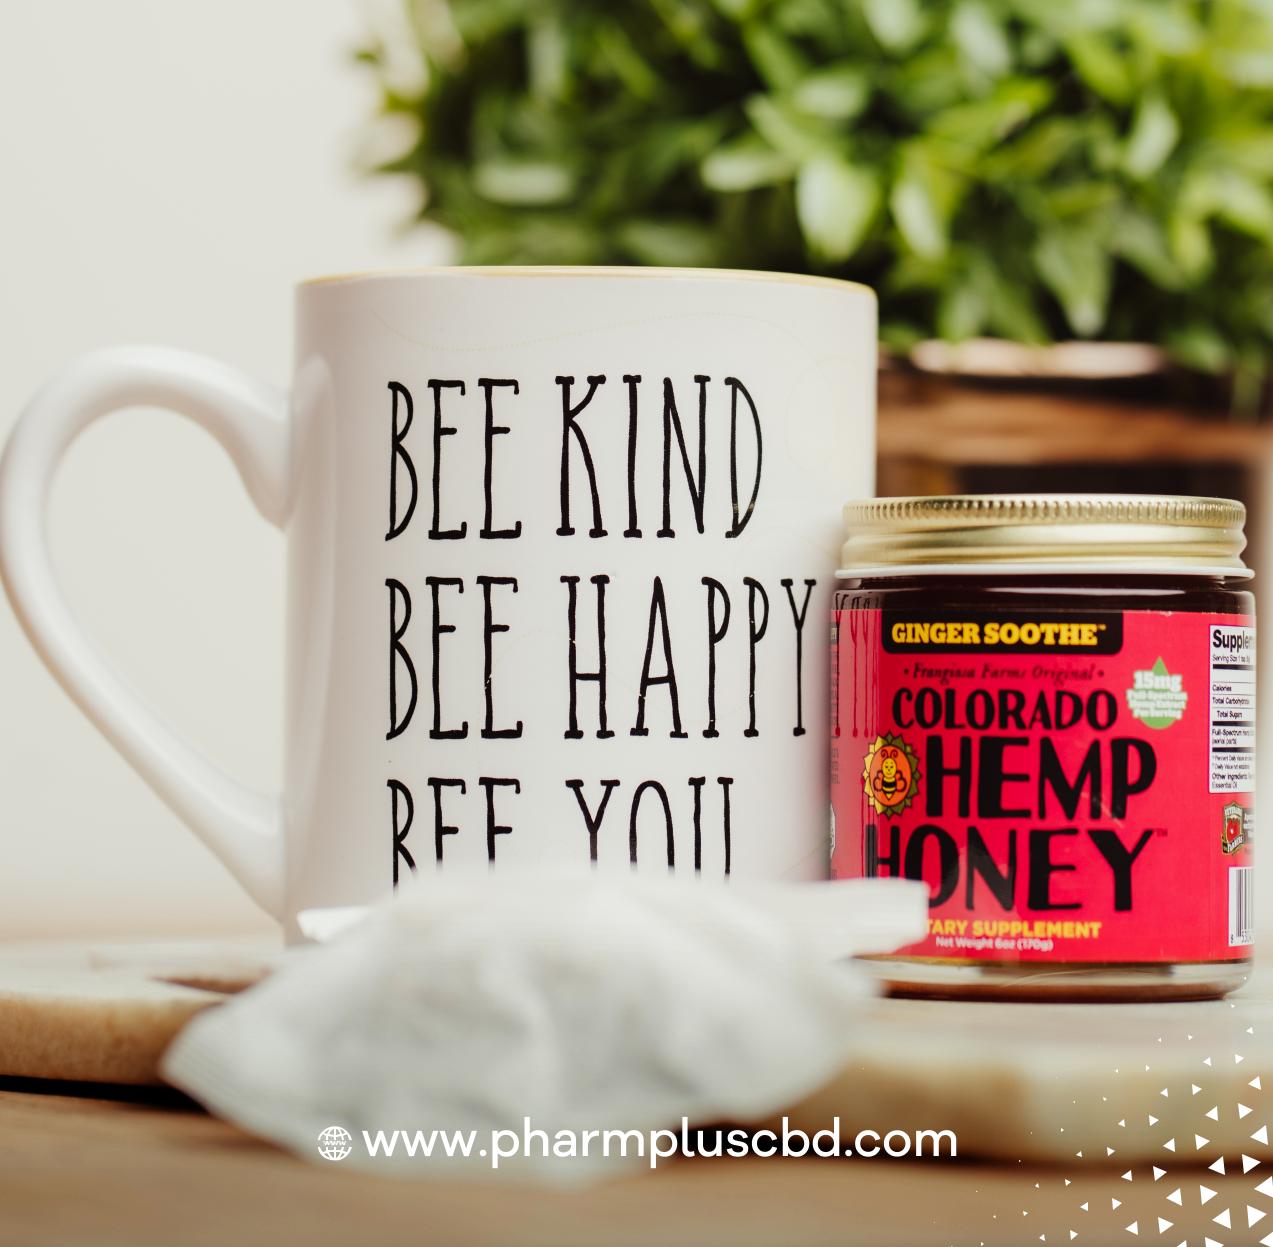 Colorado Hemp Honey Ginger Soothe 6oz Jar